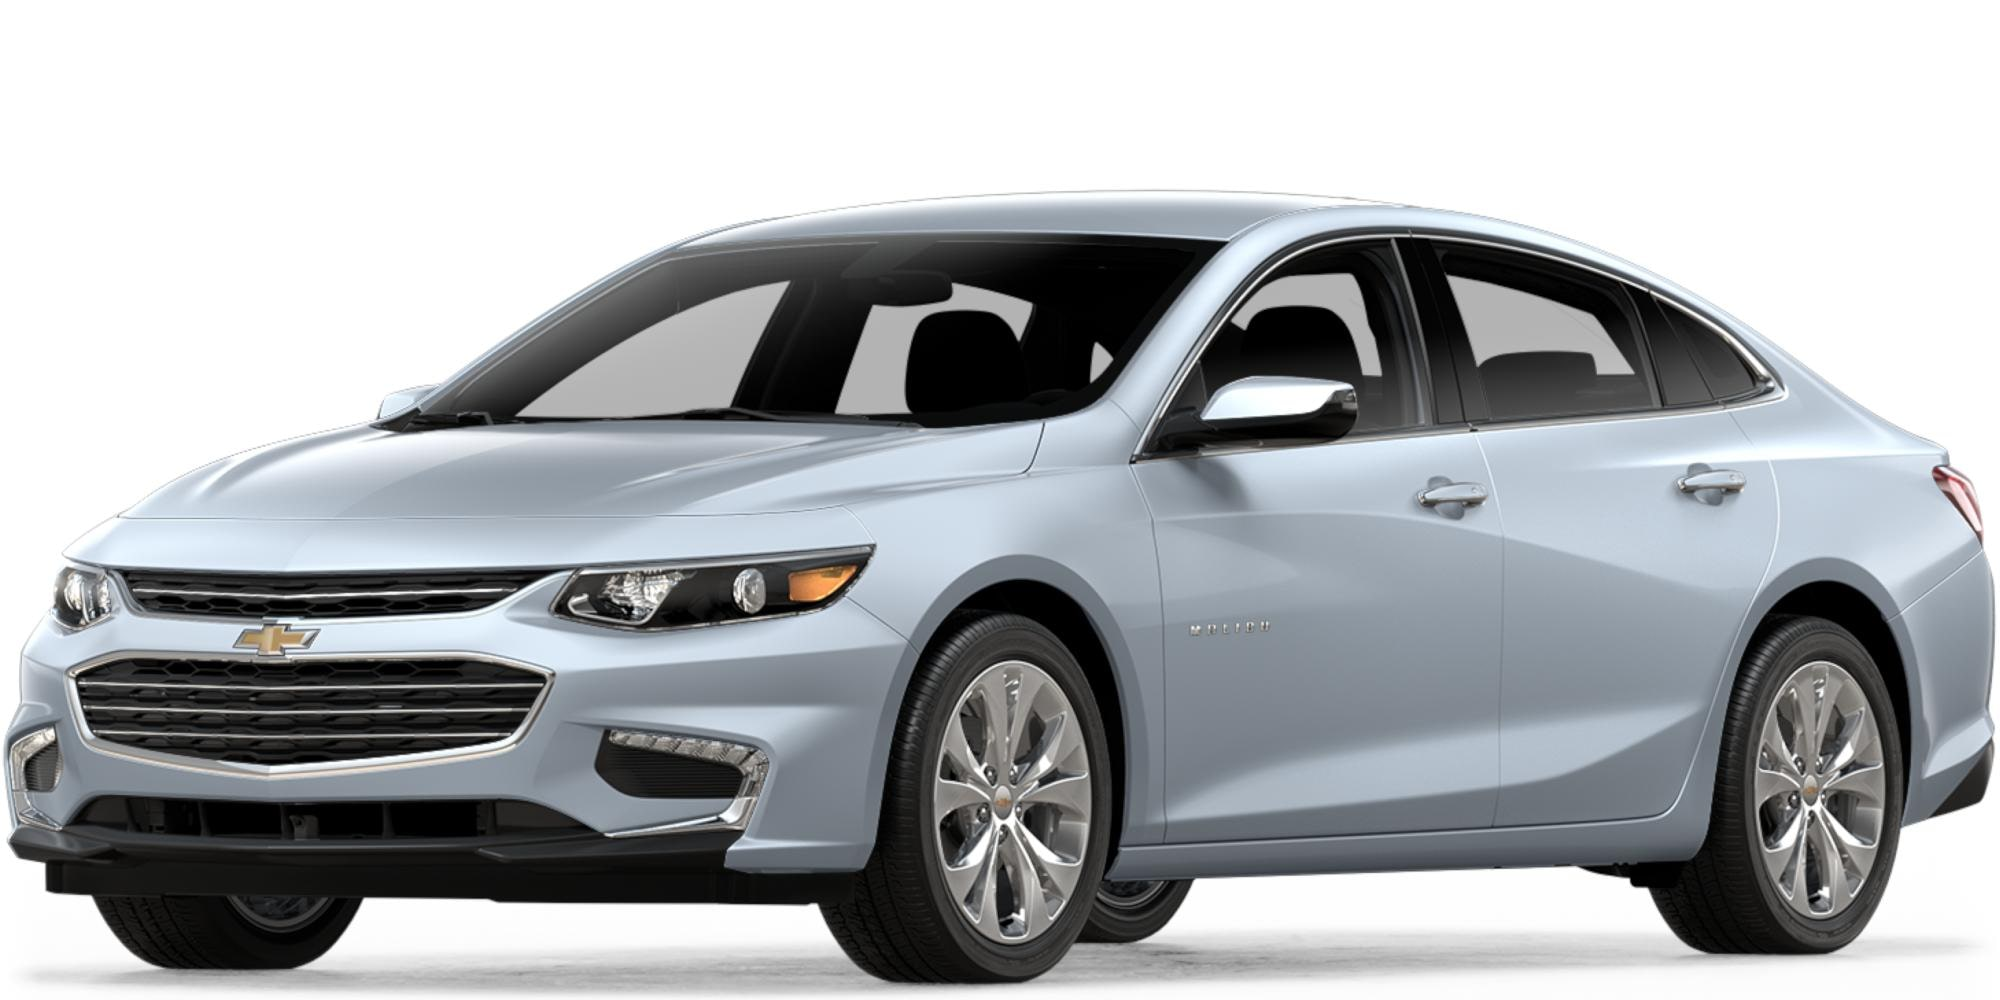 2018 Chevrolet Sonic Price >> 2018 Chevrolet Malibu for sale near Sacramento | John L Sullivan Chevrolet